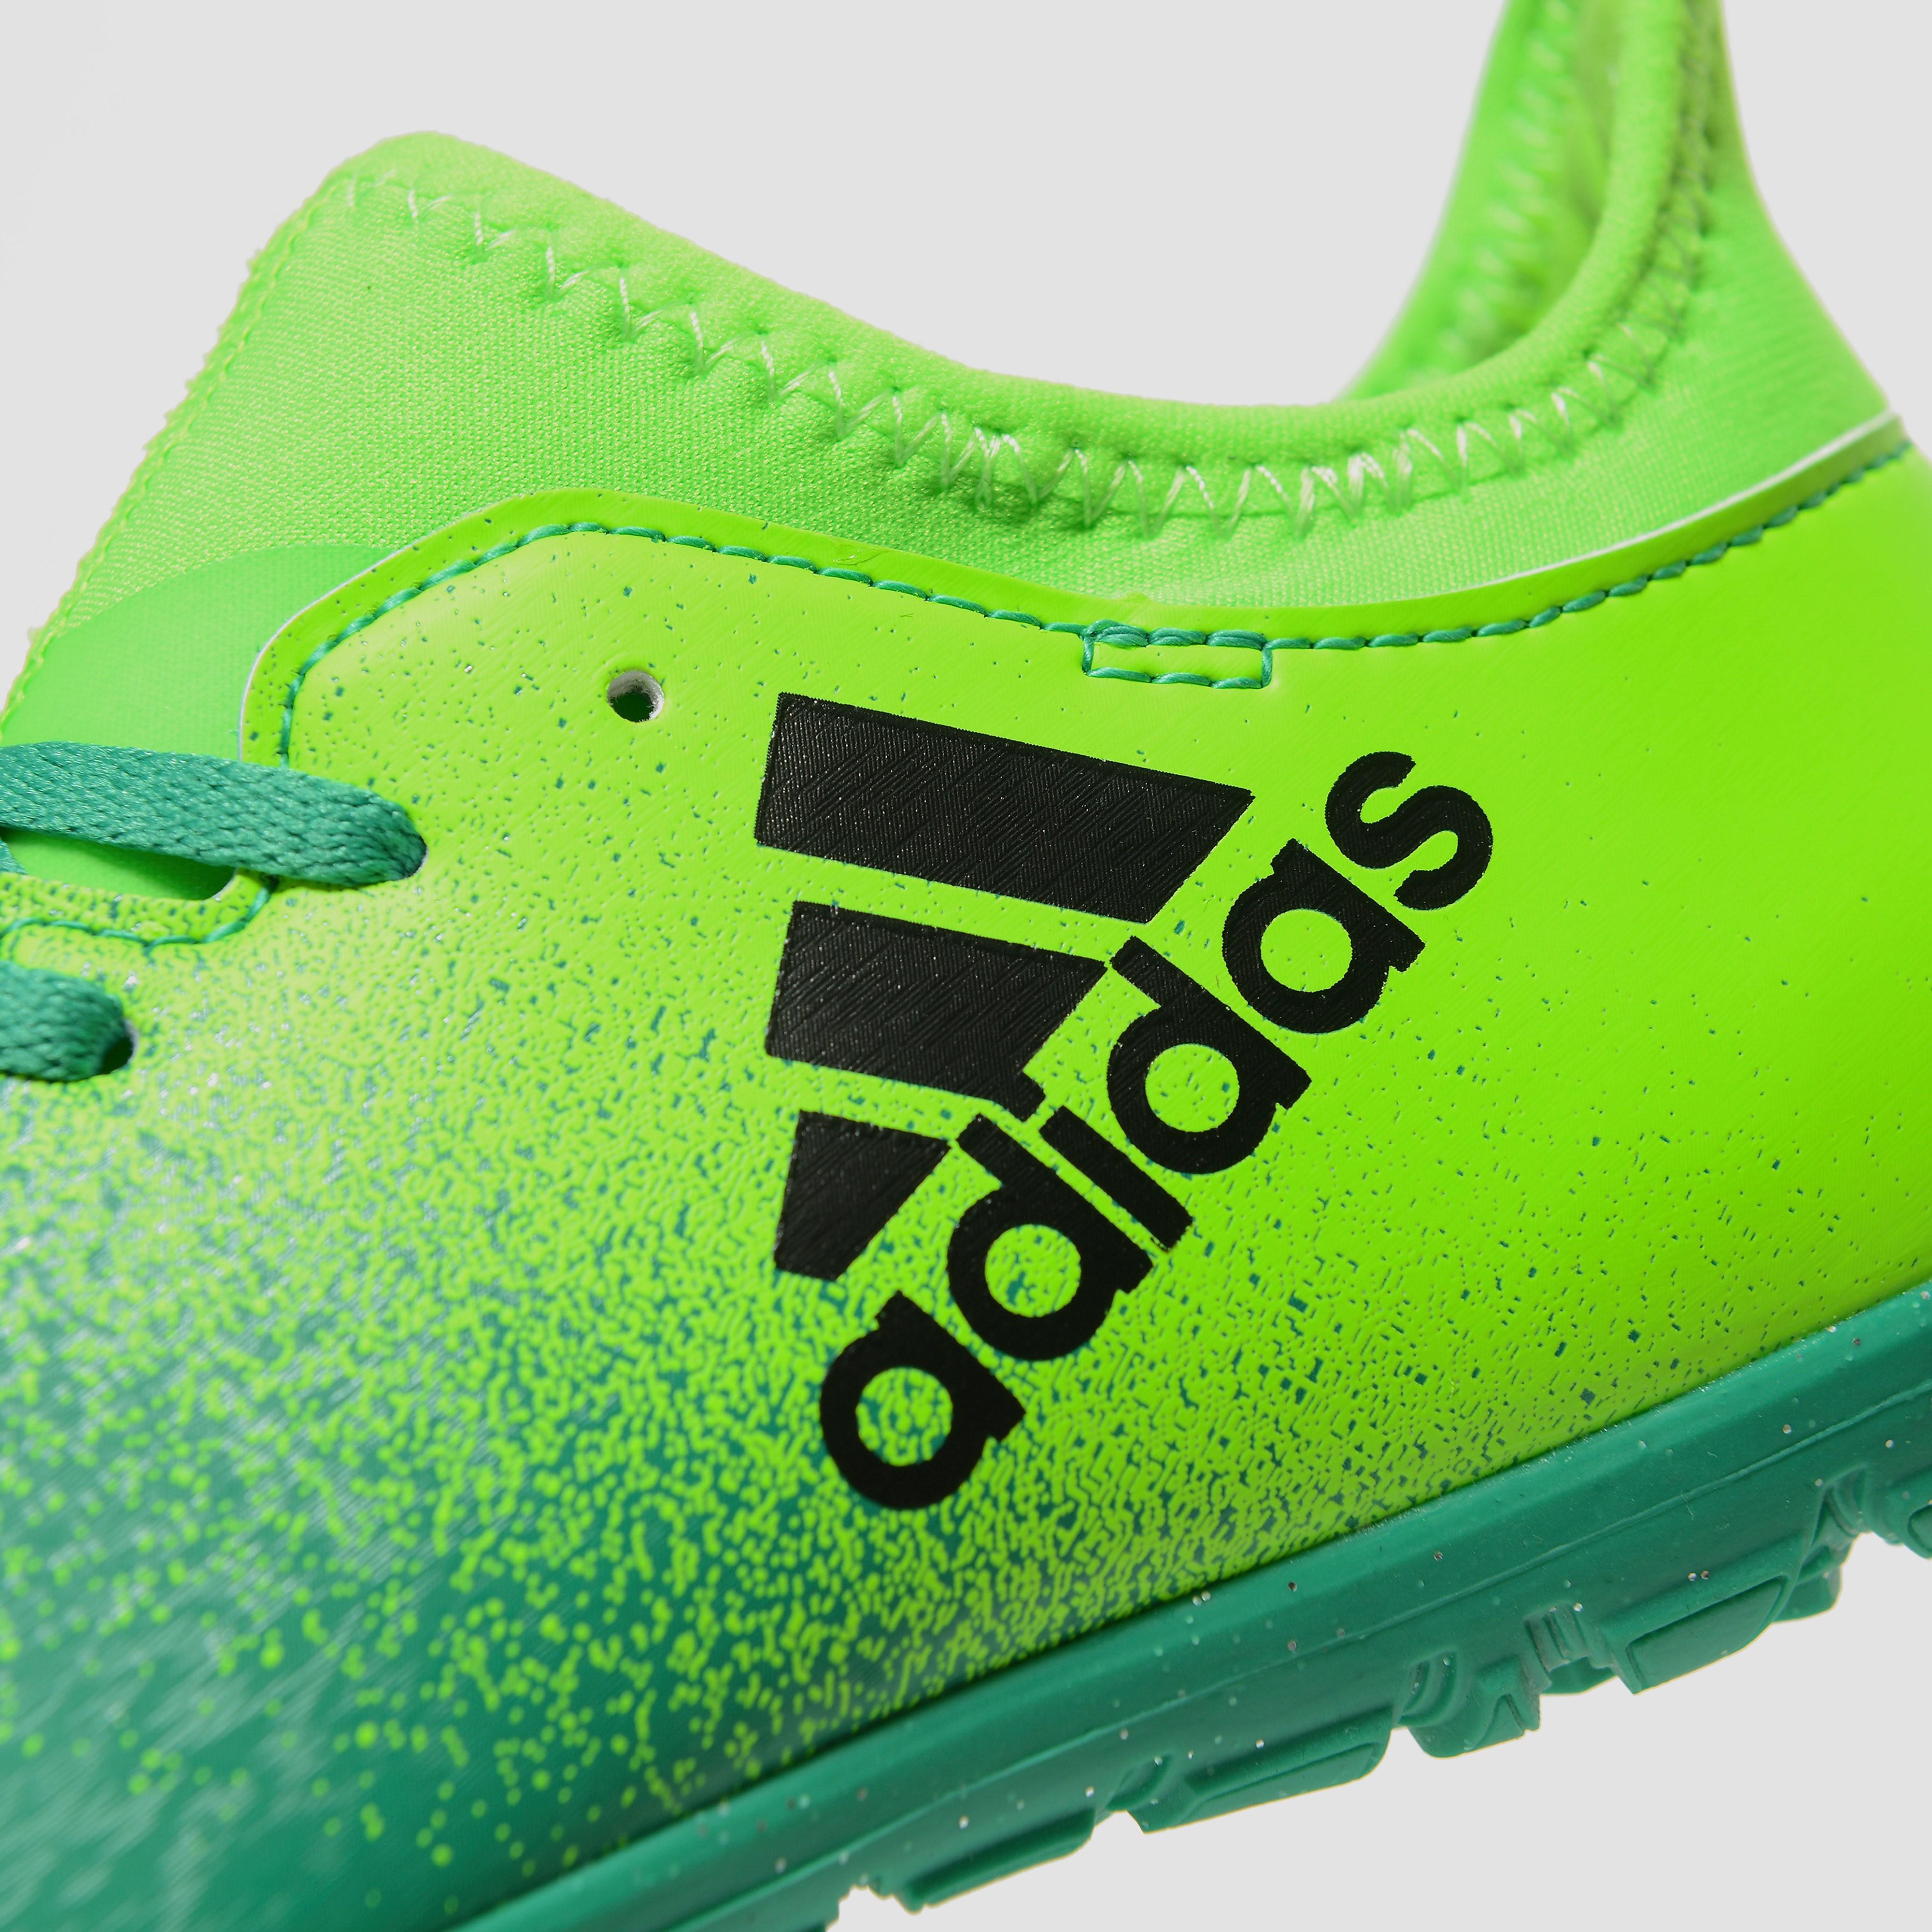 adidas Turbocharge X 17.3 TF Children's Football Boots